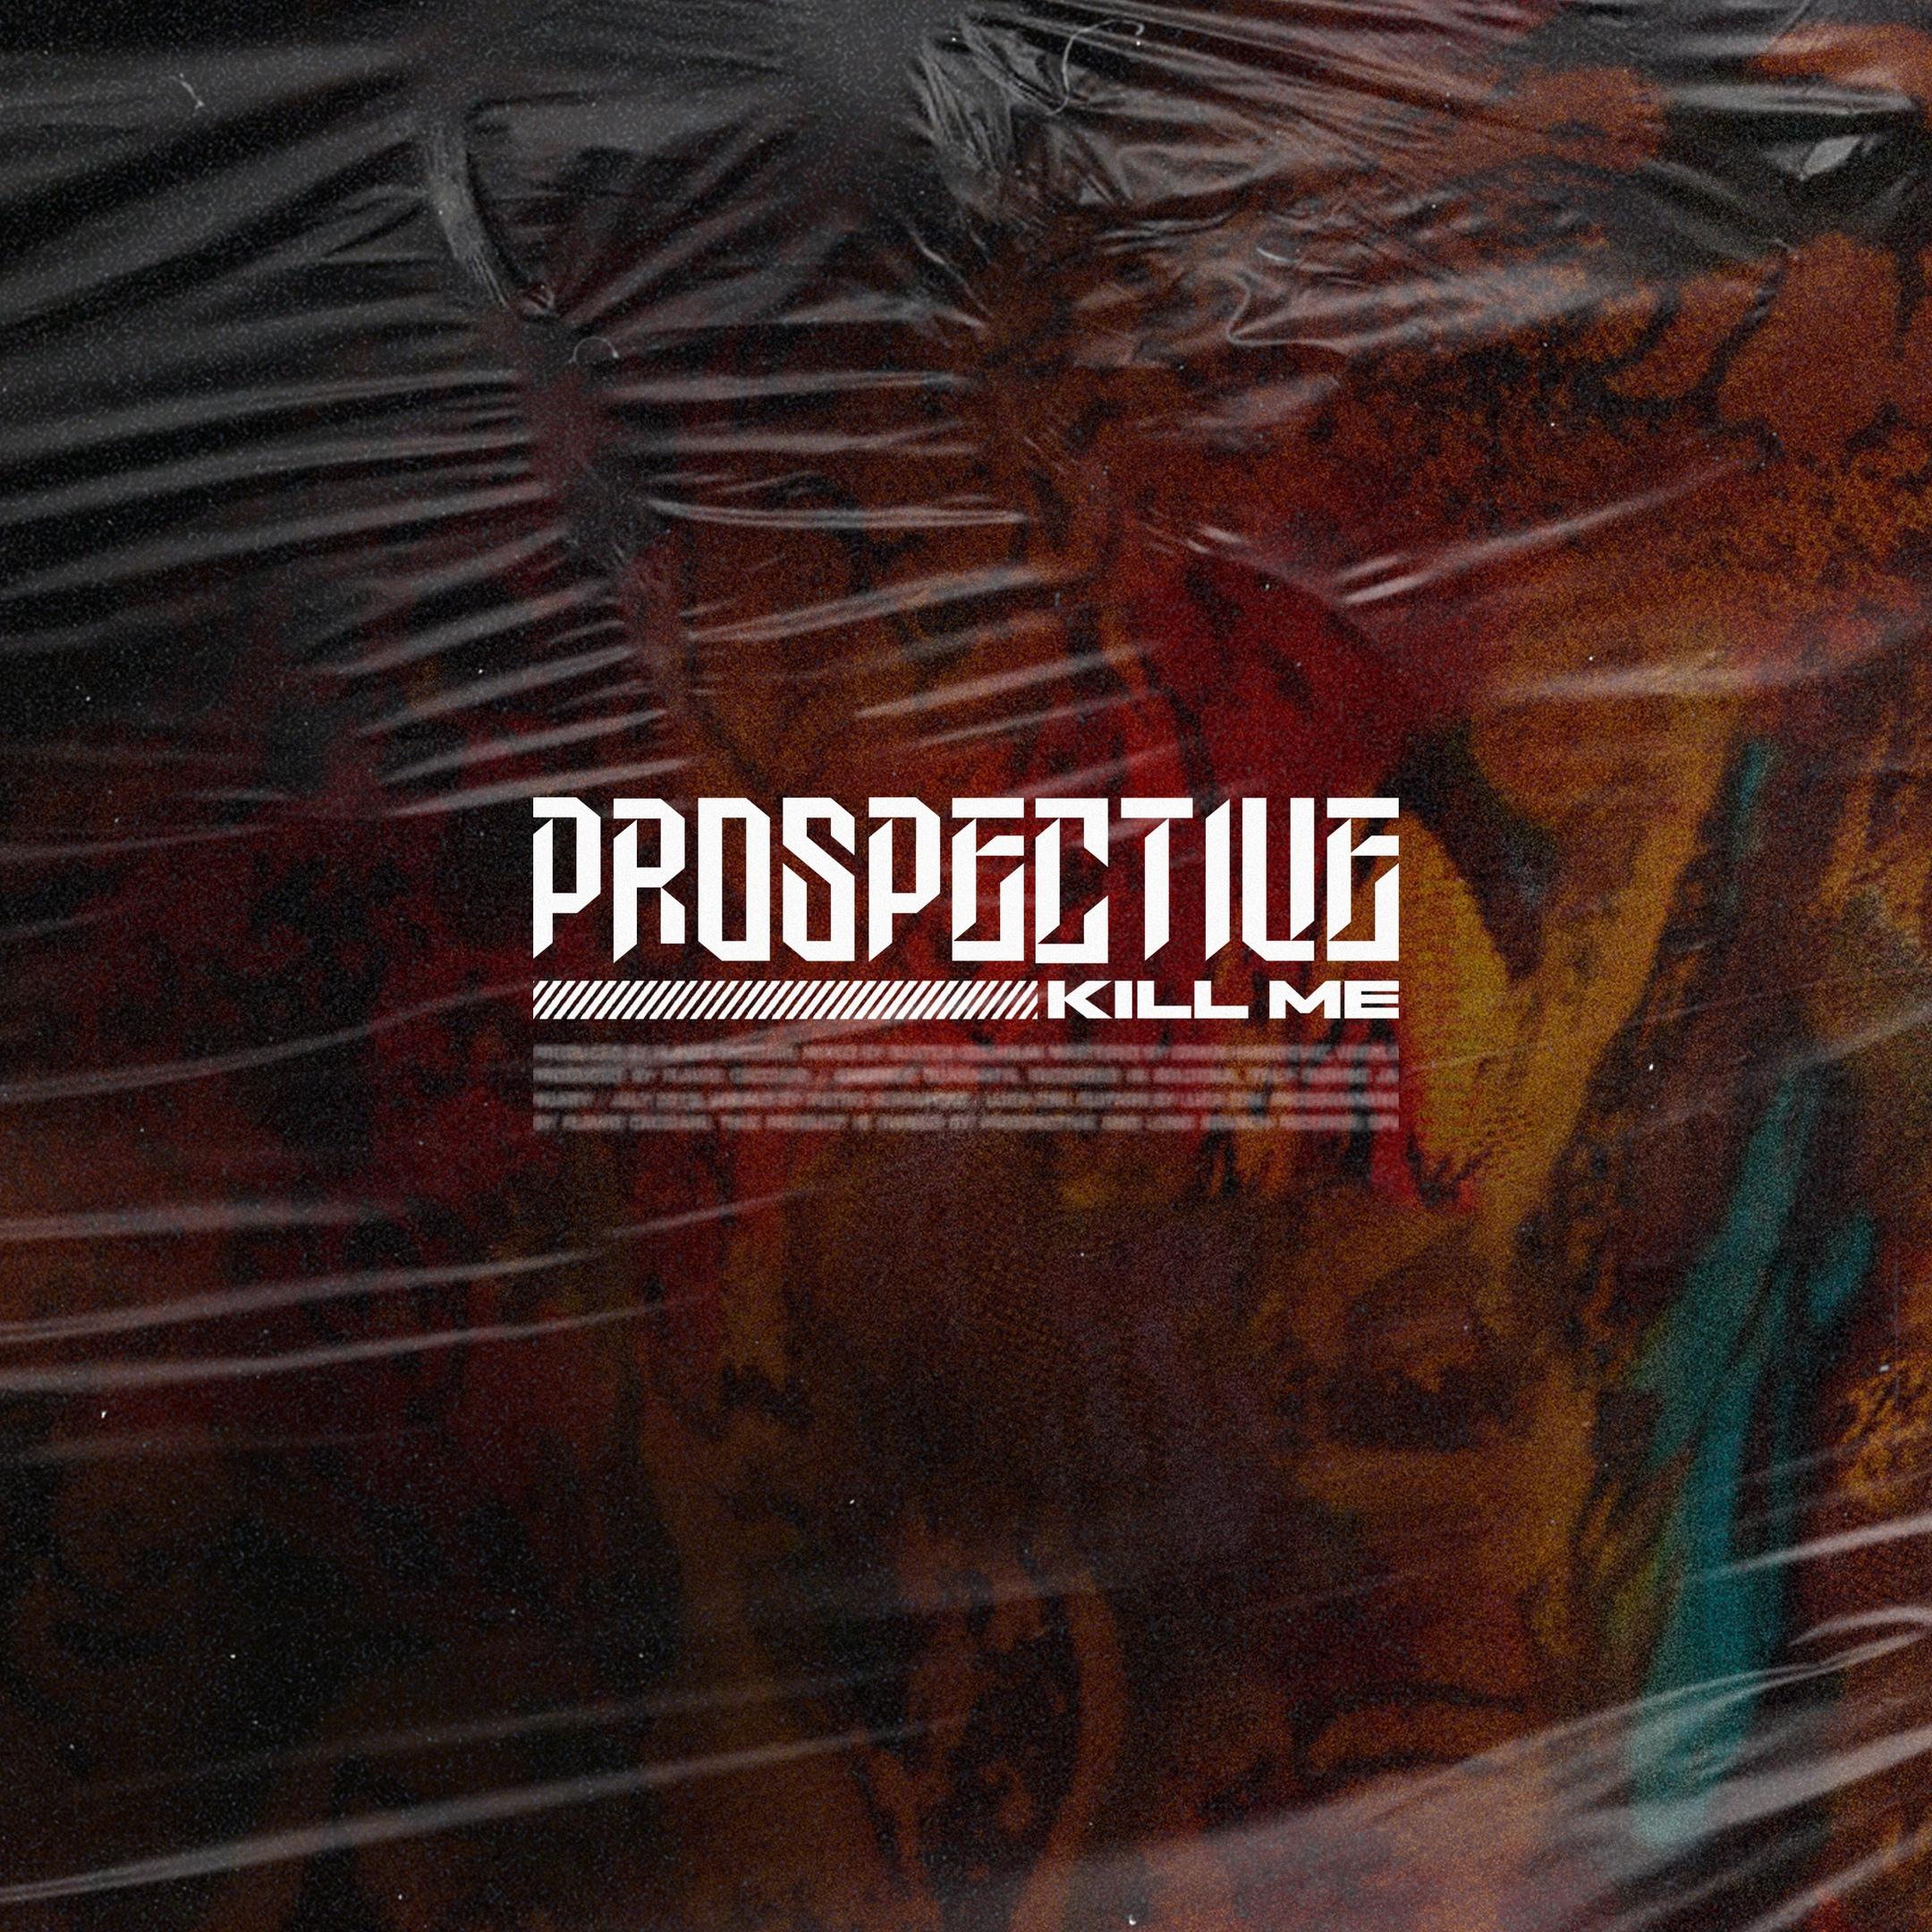 Prospective - Kill Me [single] (2019)